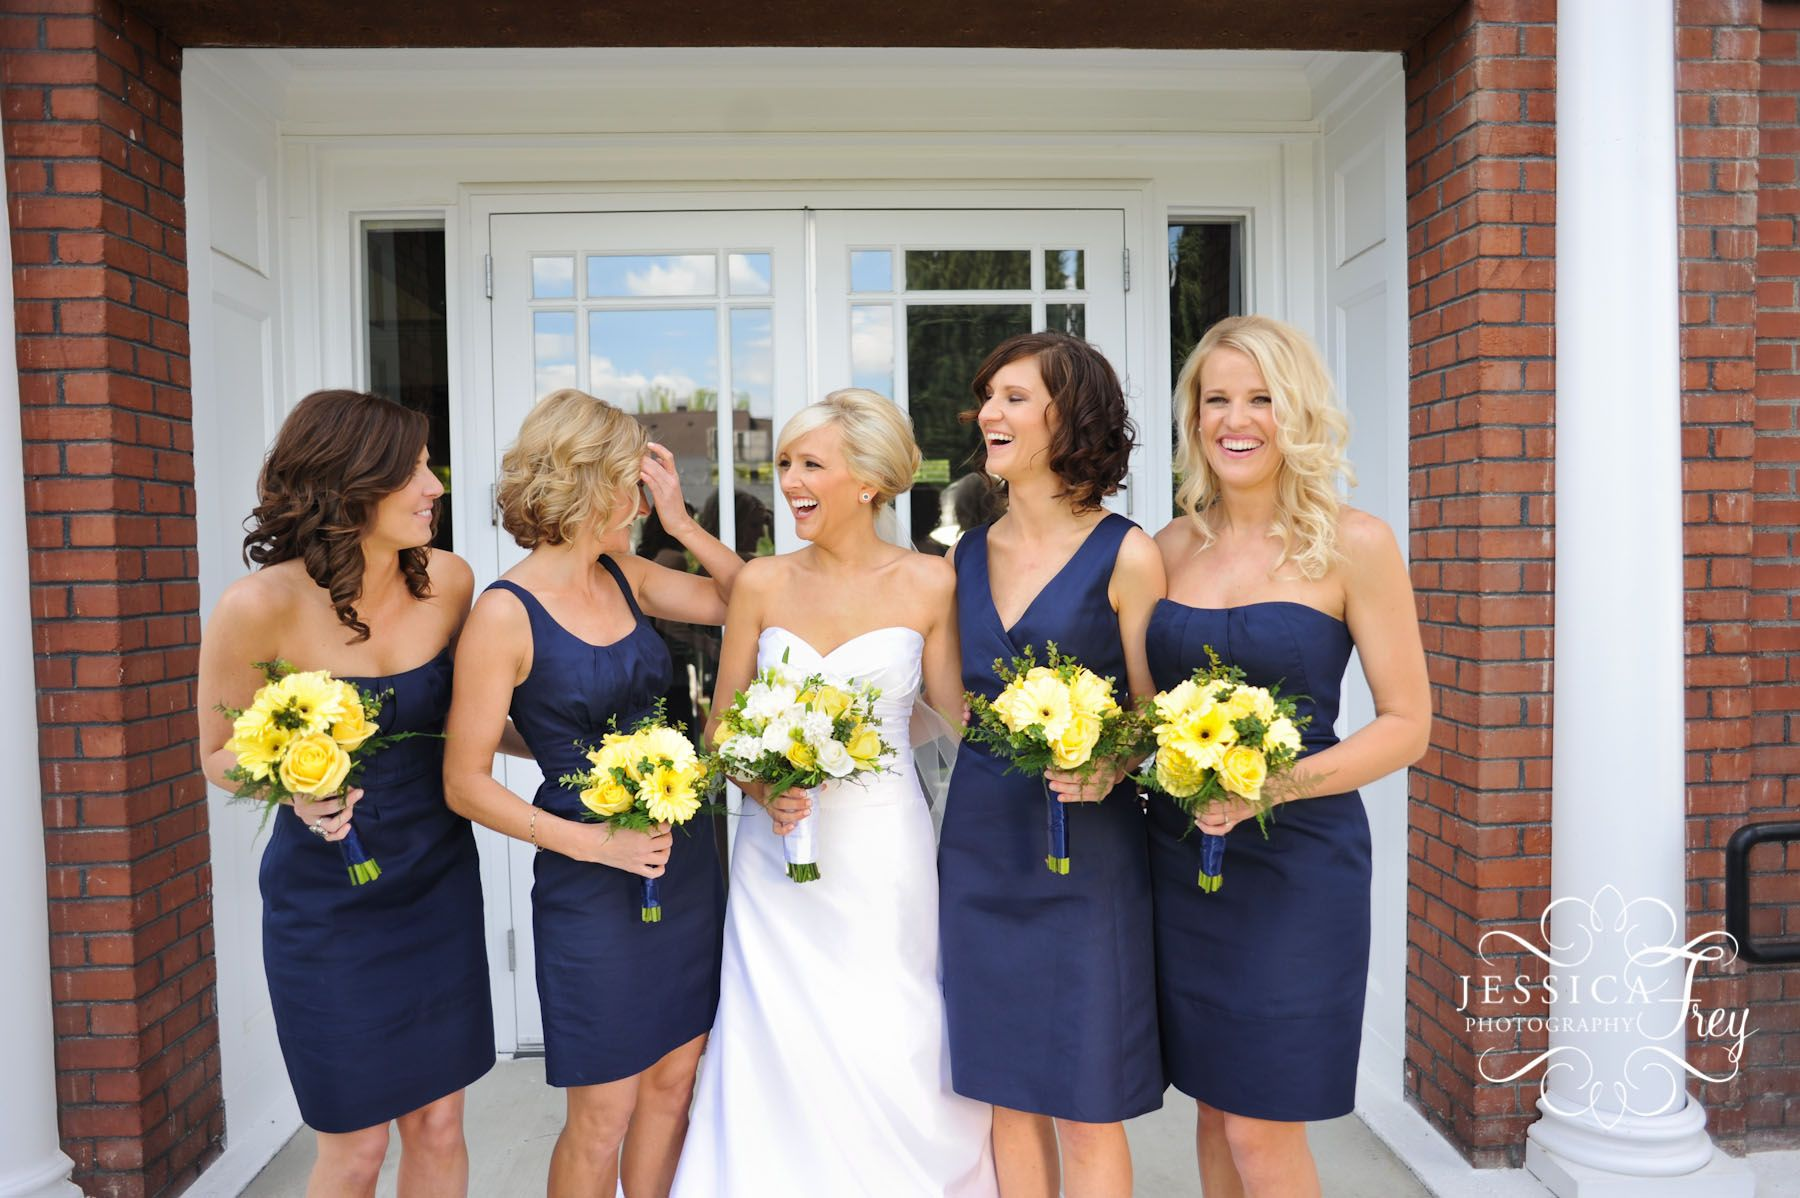 Yellow and gray dress fabric